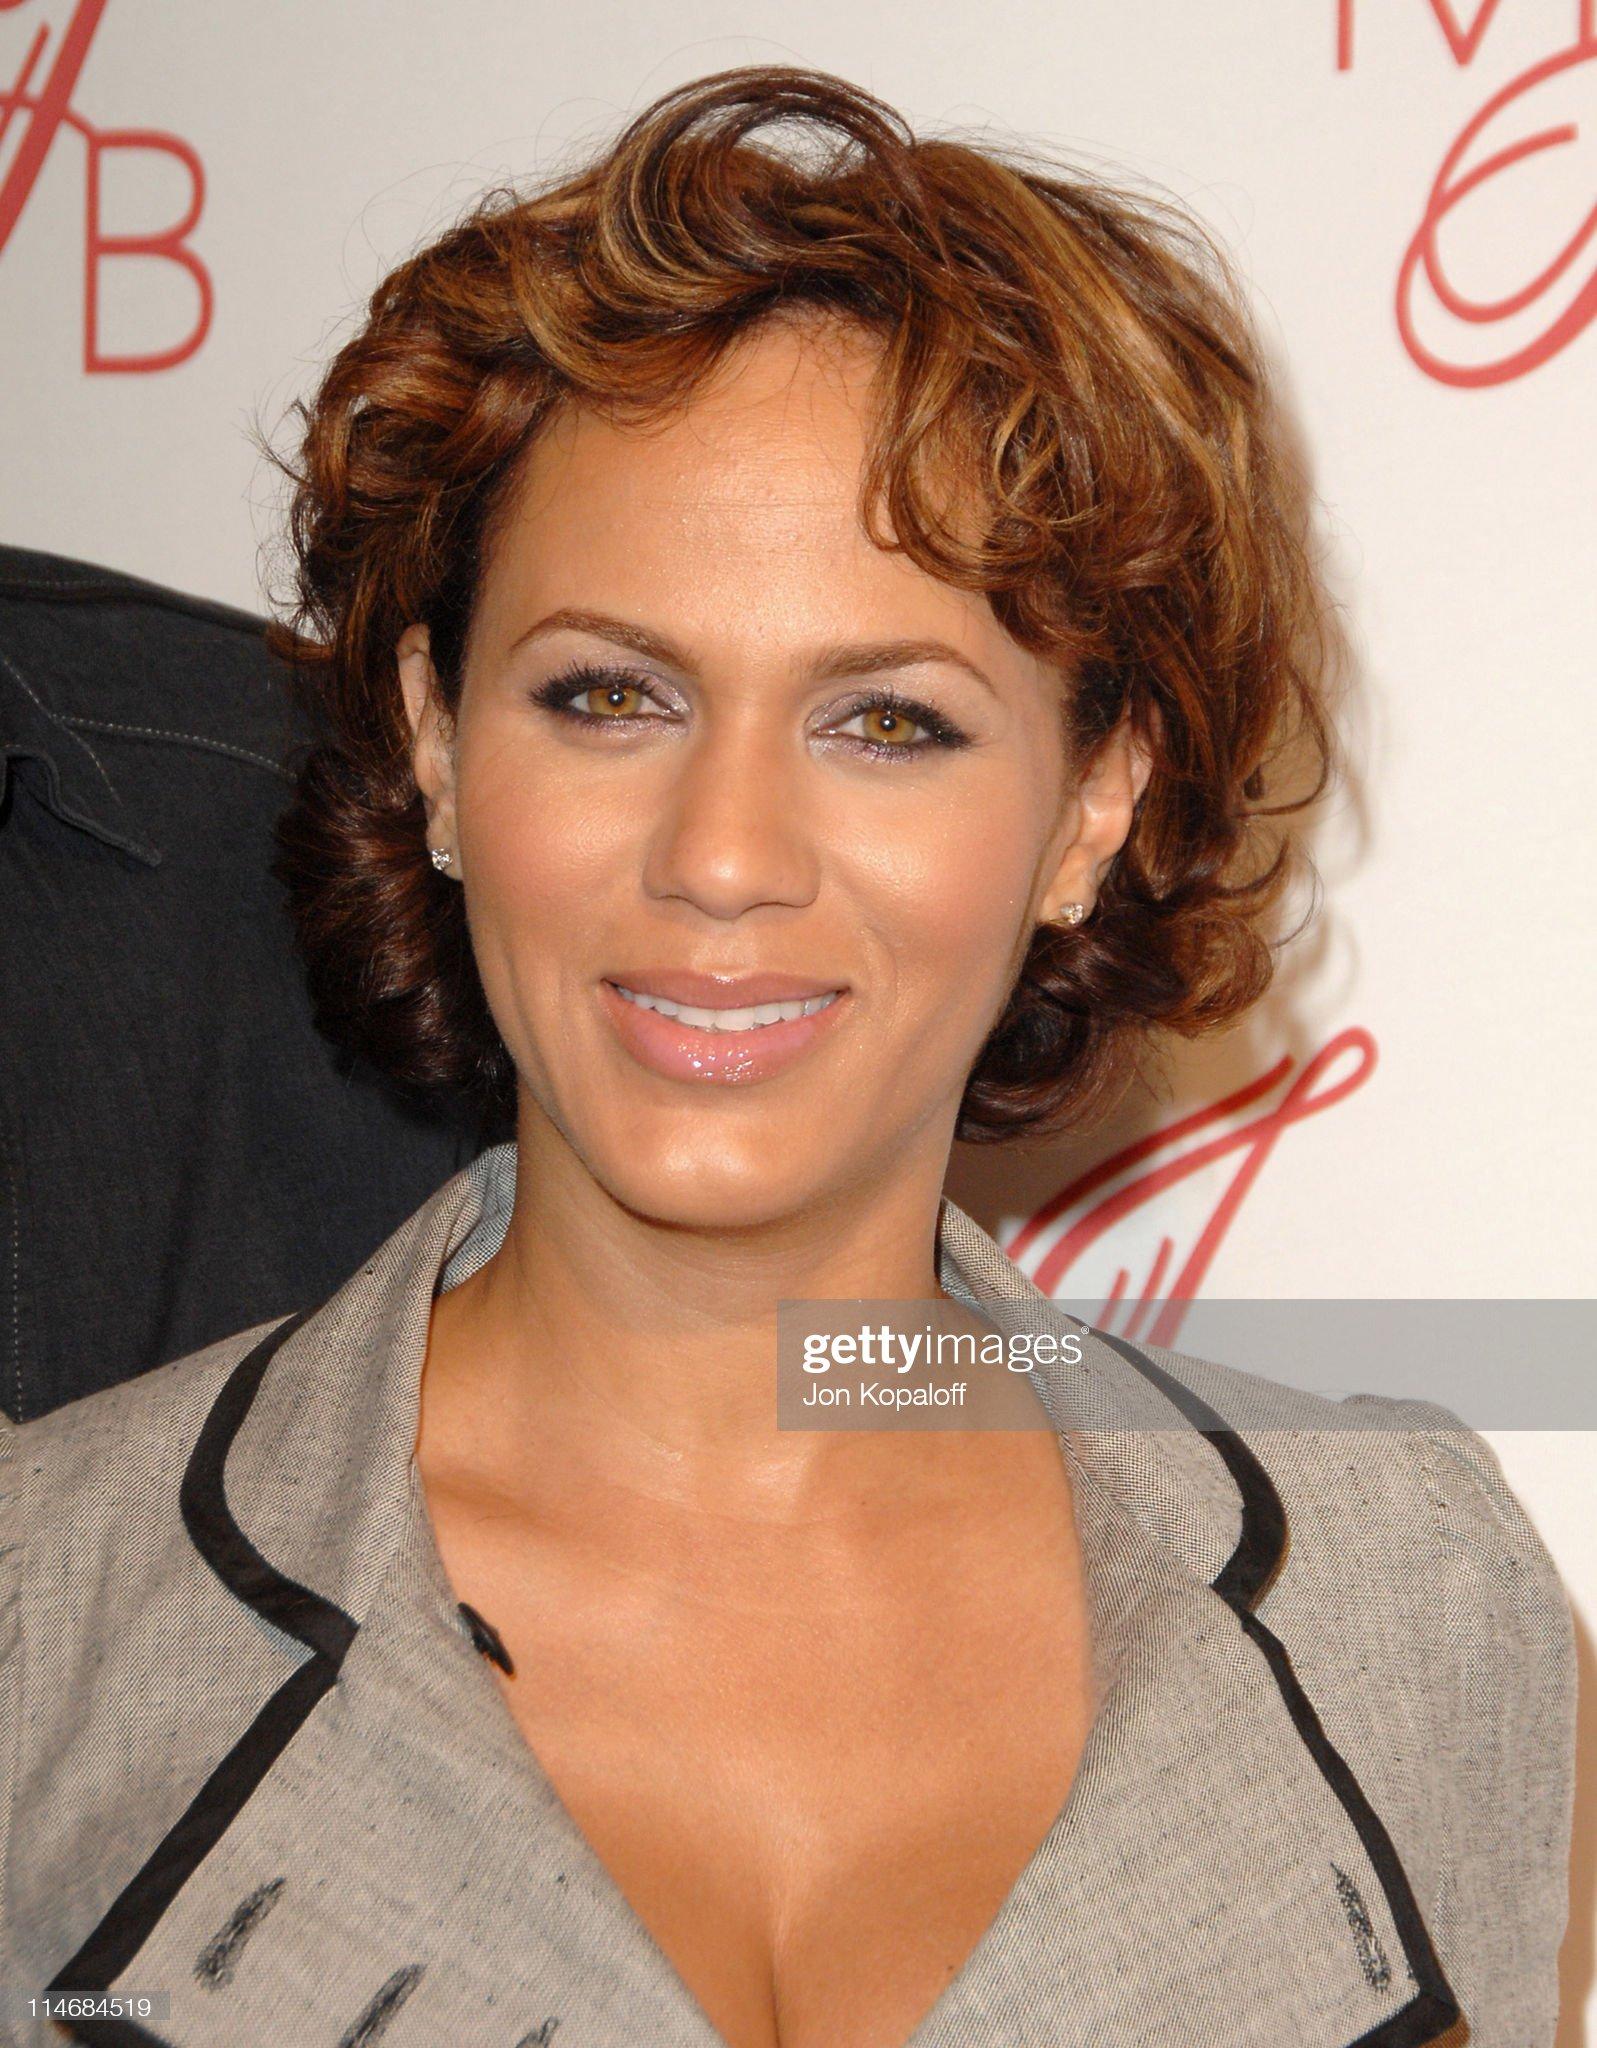 Hazel eyes - Personas famosas con los ojos de color AVELLANA Nicole-ari-parker-during-will-smith-and-jada-pinkett-smith-host-to-picture-id114684519?s=2048x2048